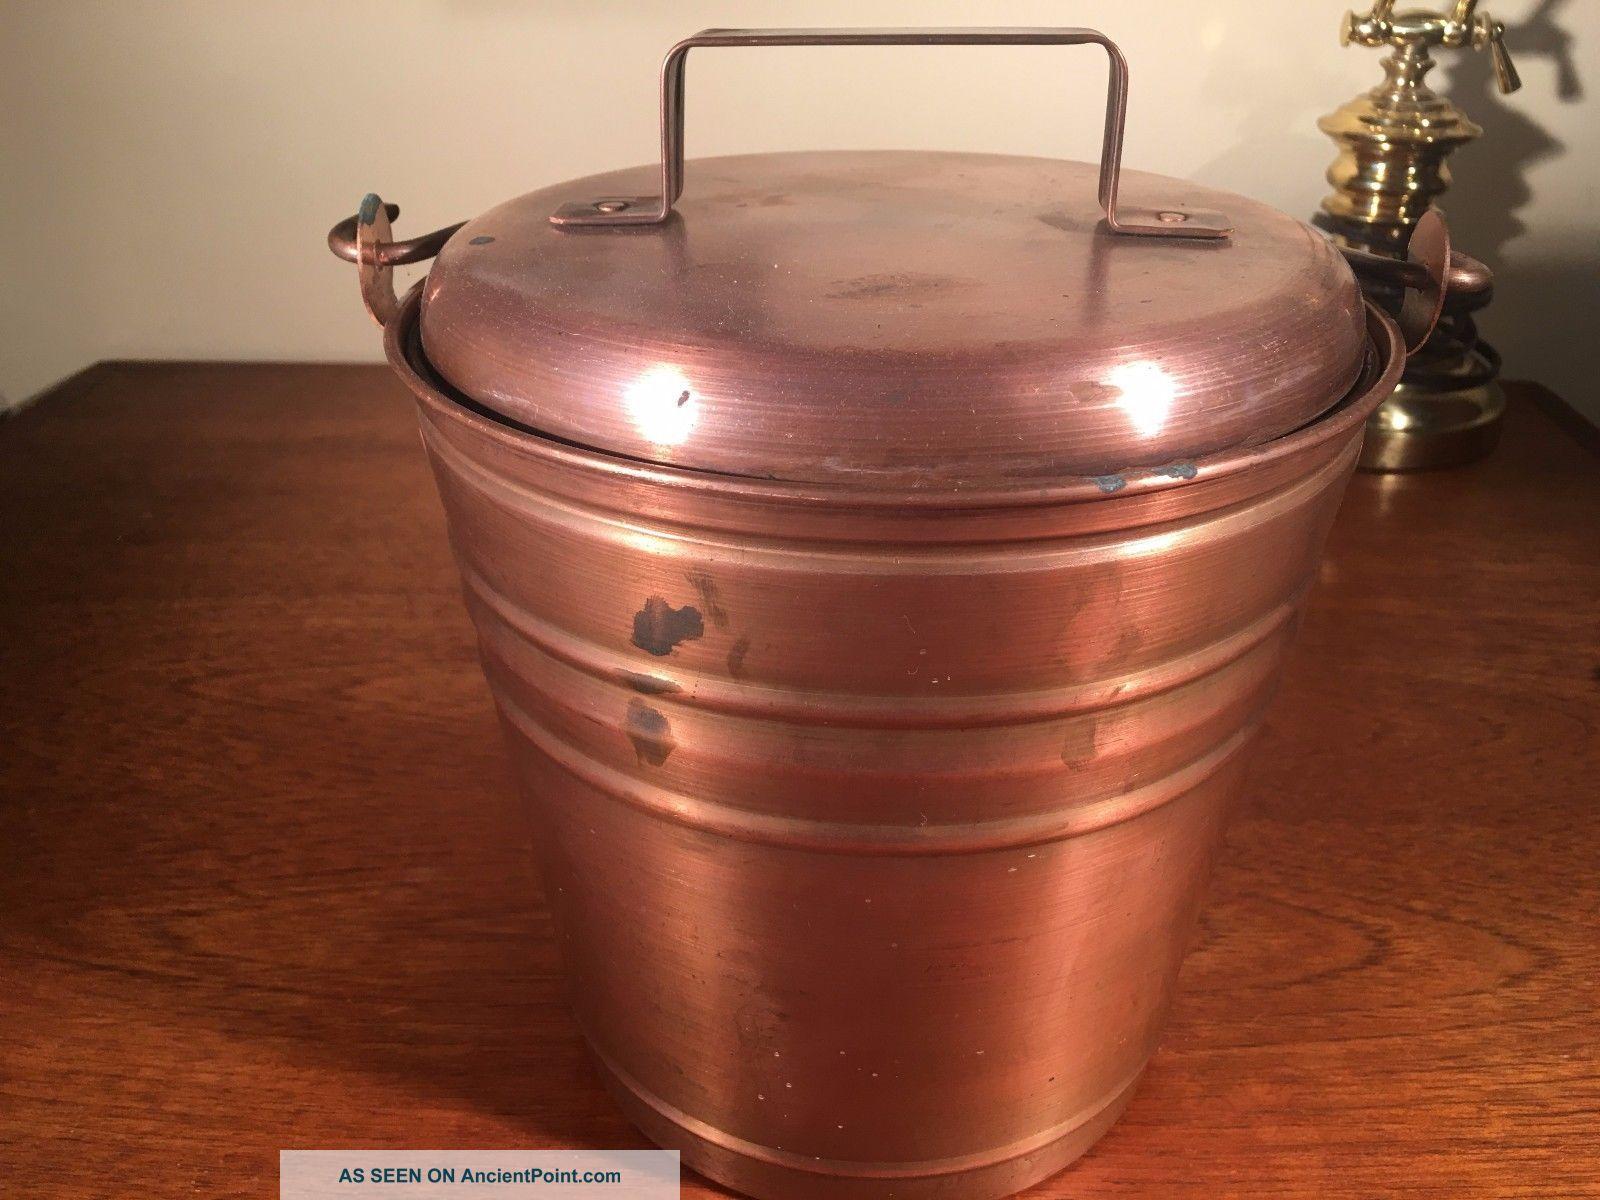 1 Smith & Hawken Hearthside Fireplace Ash Bucket Copper W Patina Hearth Ware photo